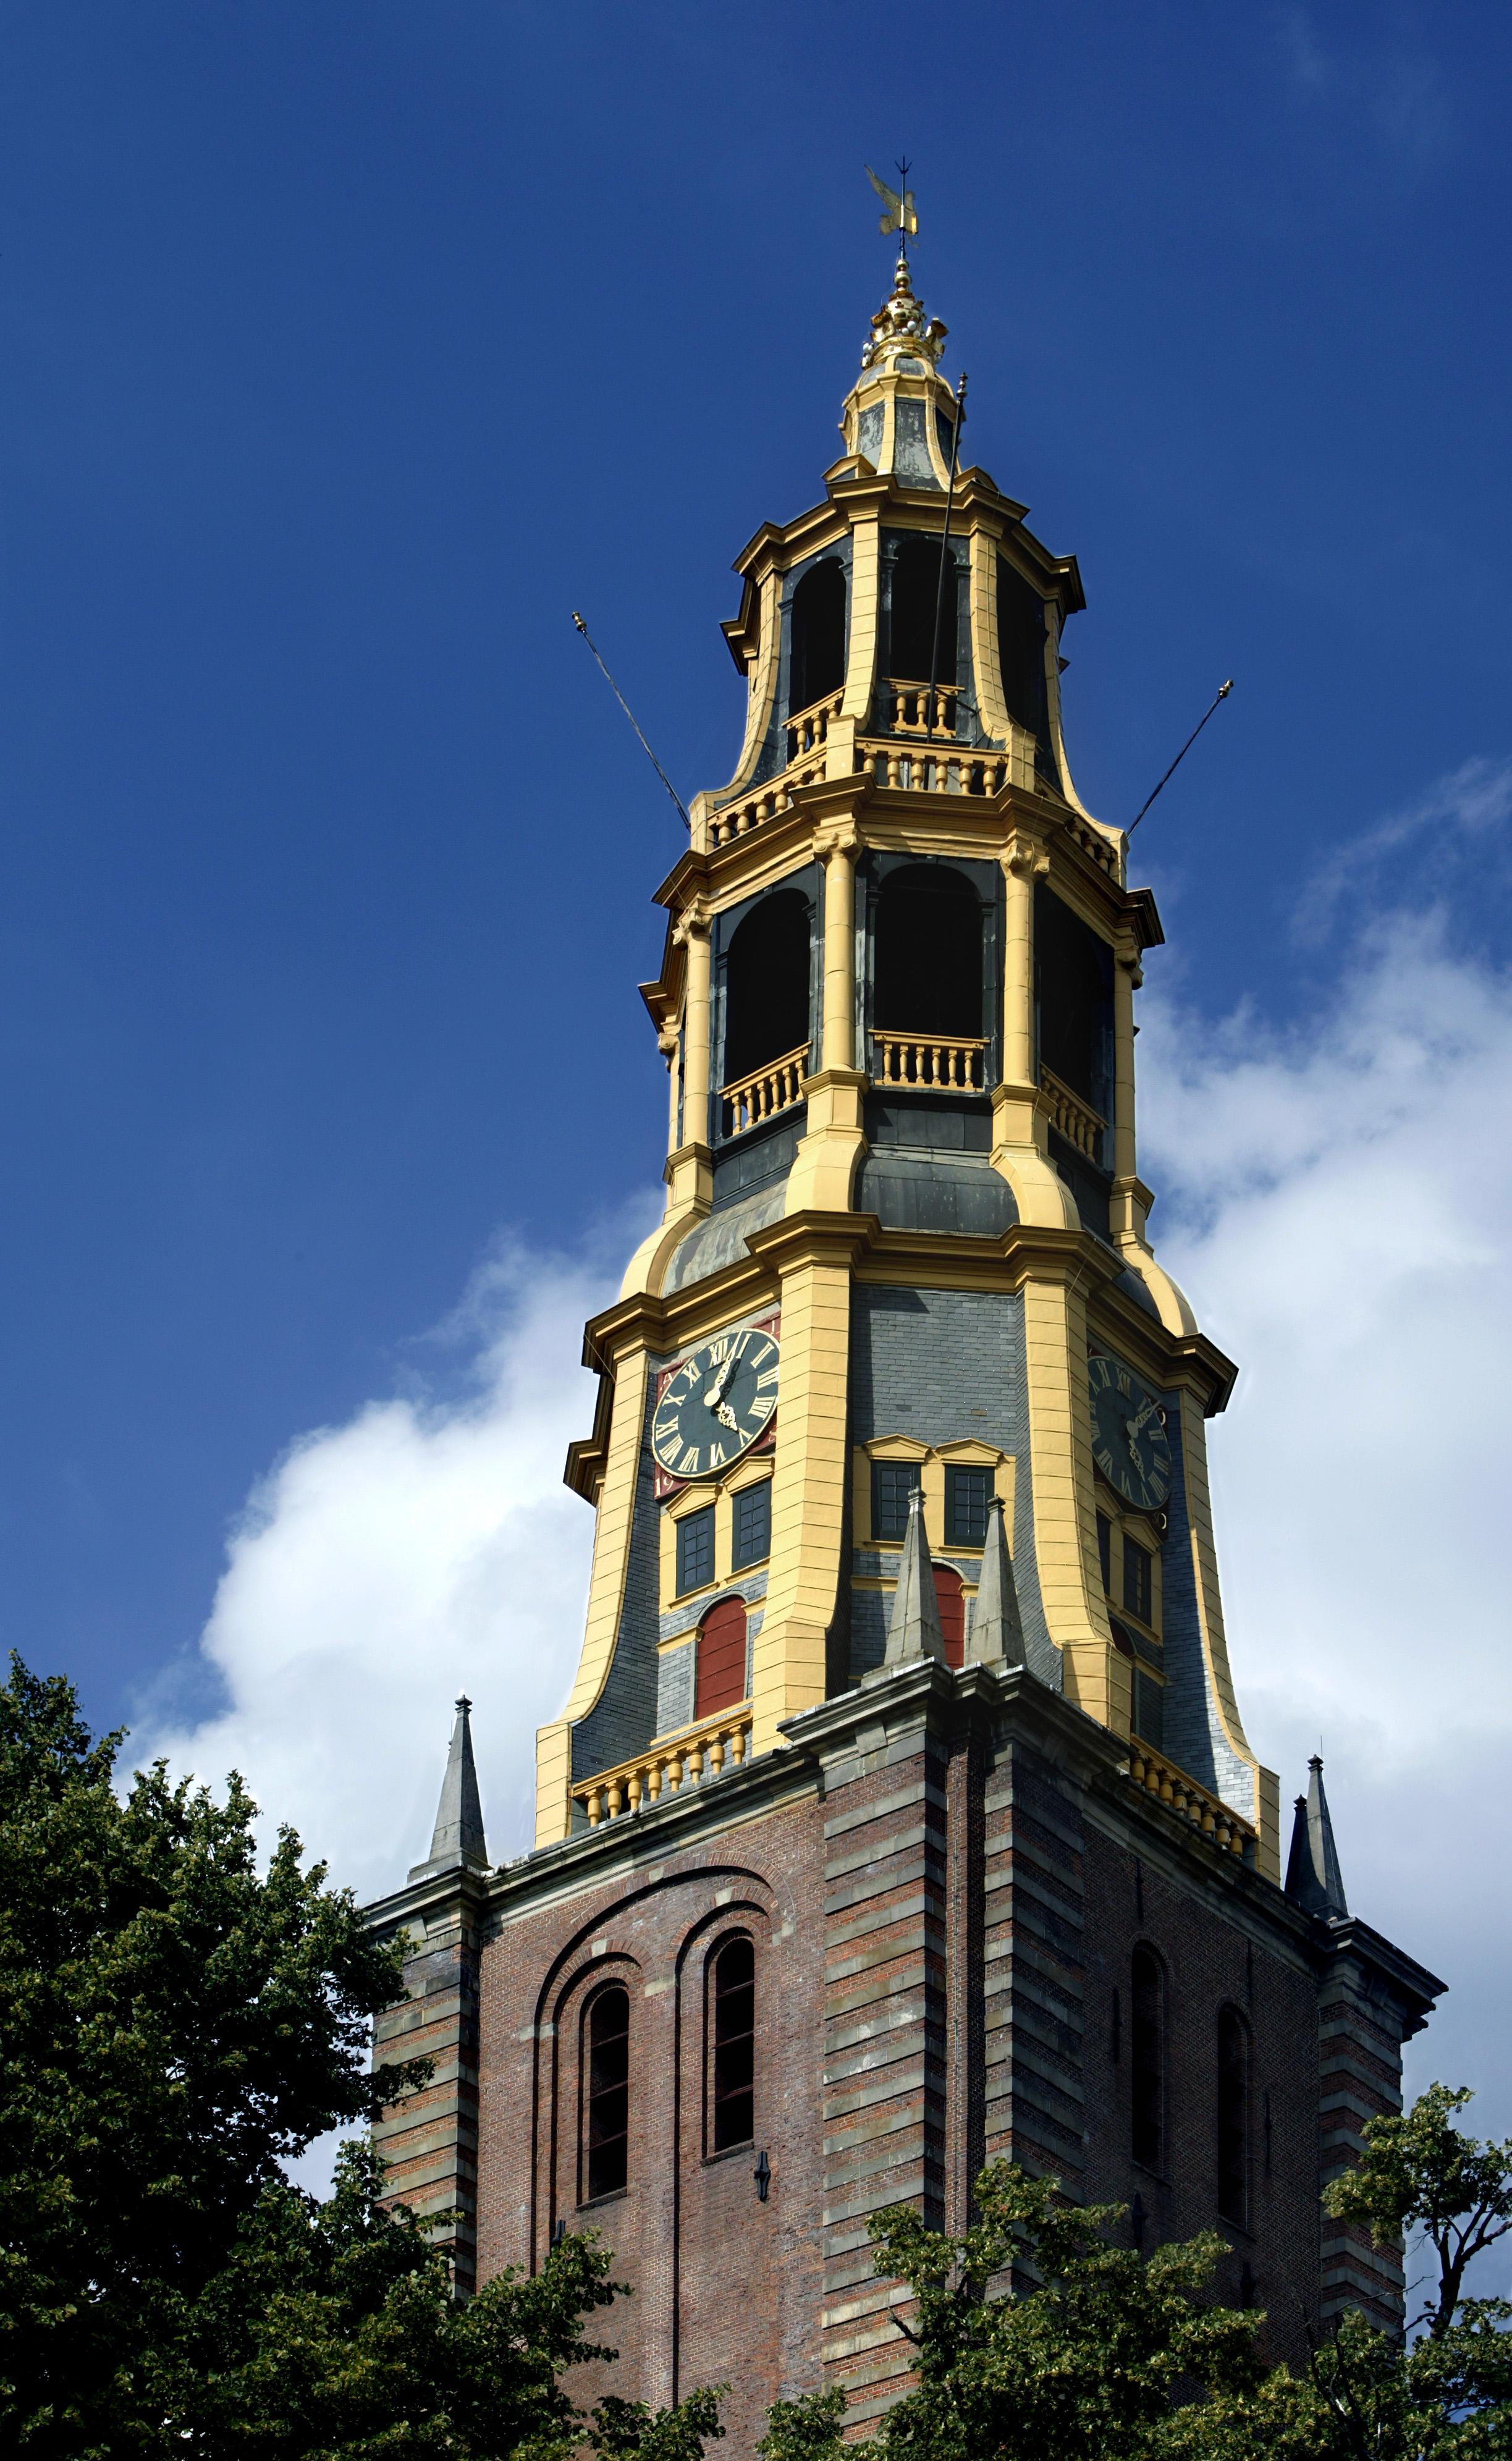 - Foto-Der-Aa-kerk-toren.-Fotograaf-Omke-Oudeman